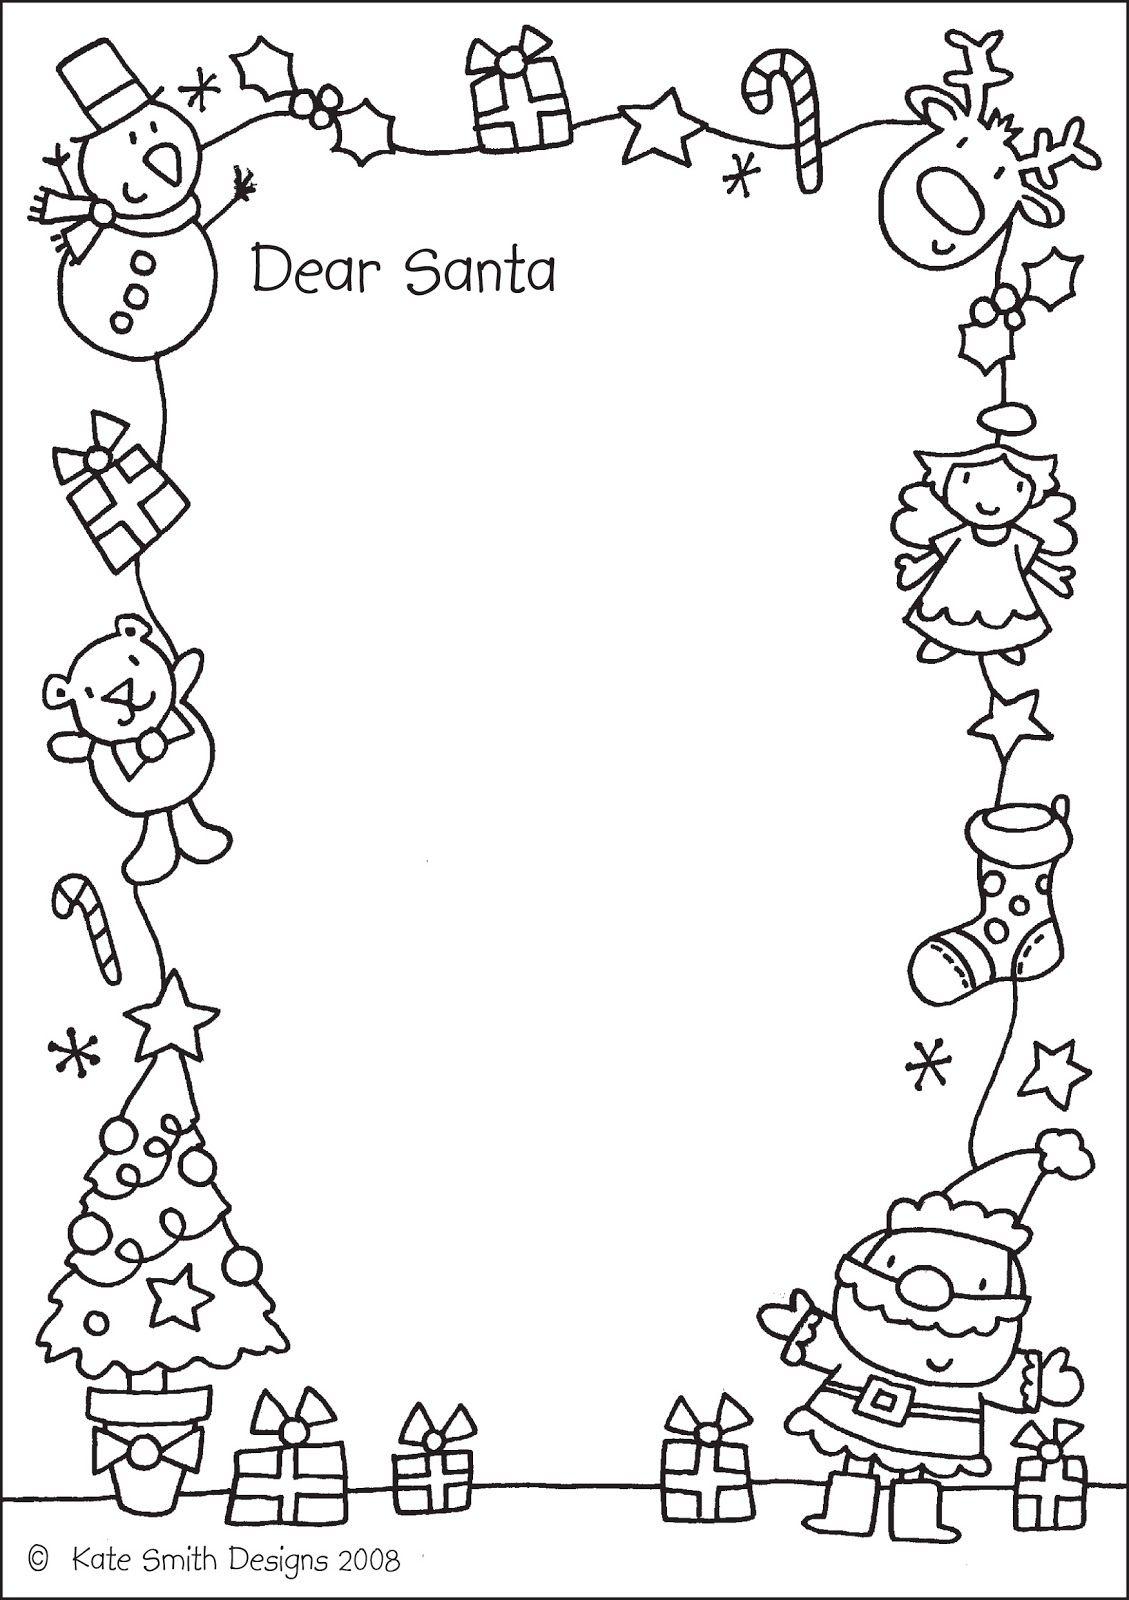 16 Free Letter To Santa Templates For Kids Dear Santa Santa And